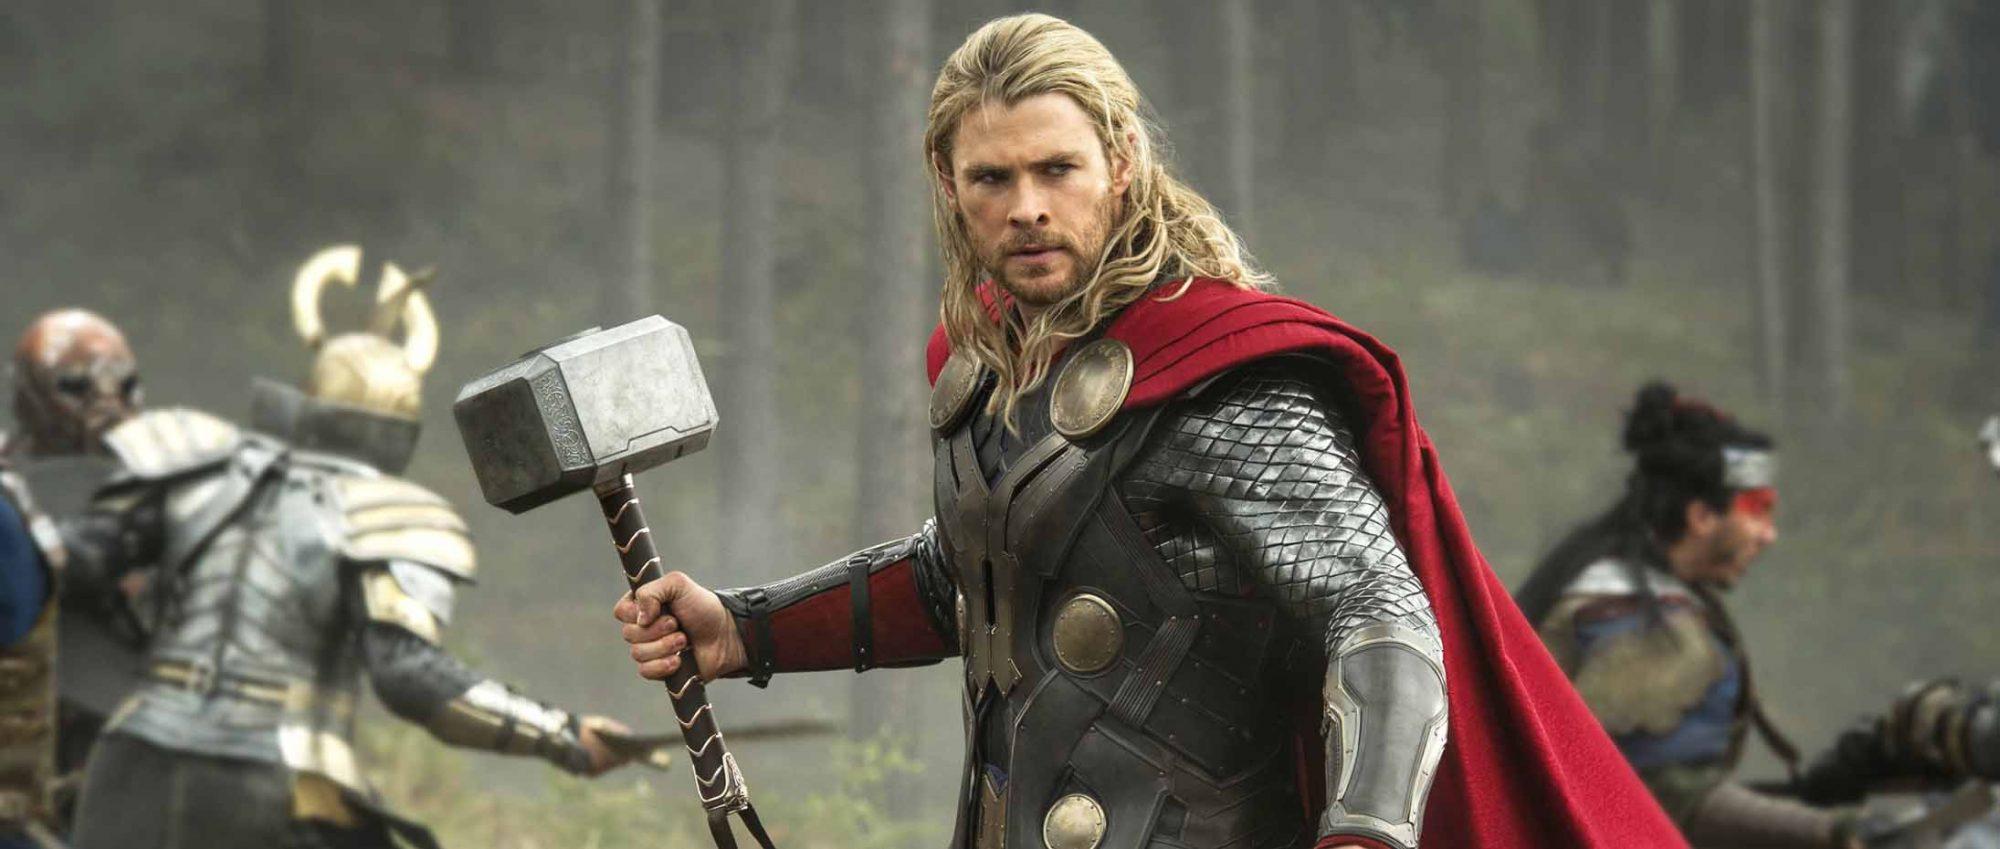 Thor-The-Dark-World-Chris-Hemsworth-hammer